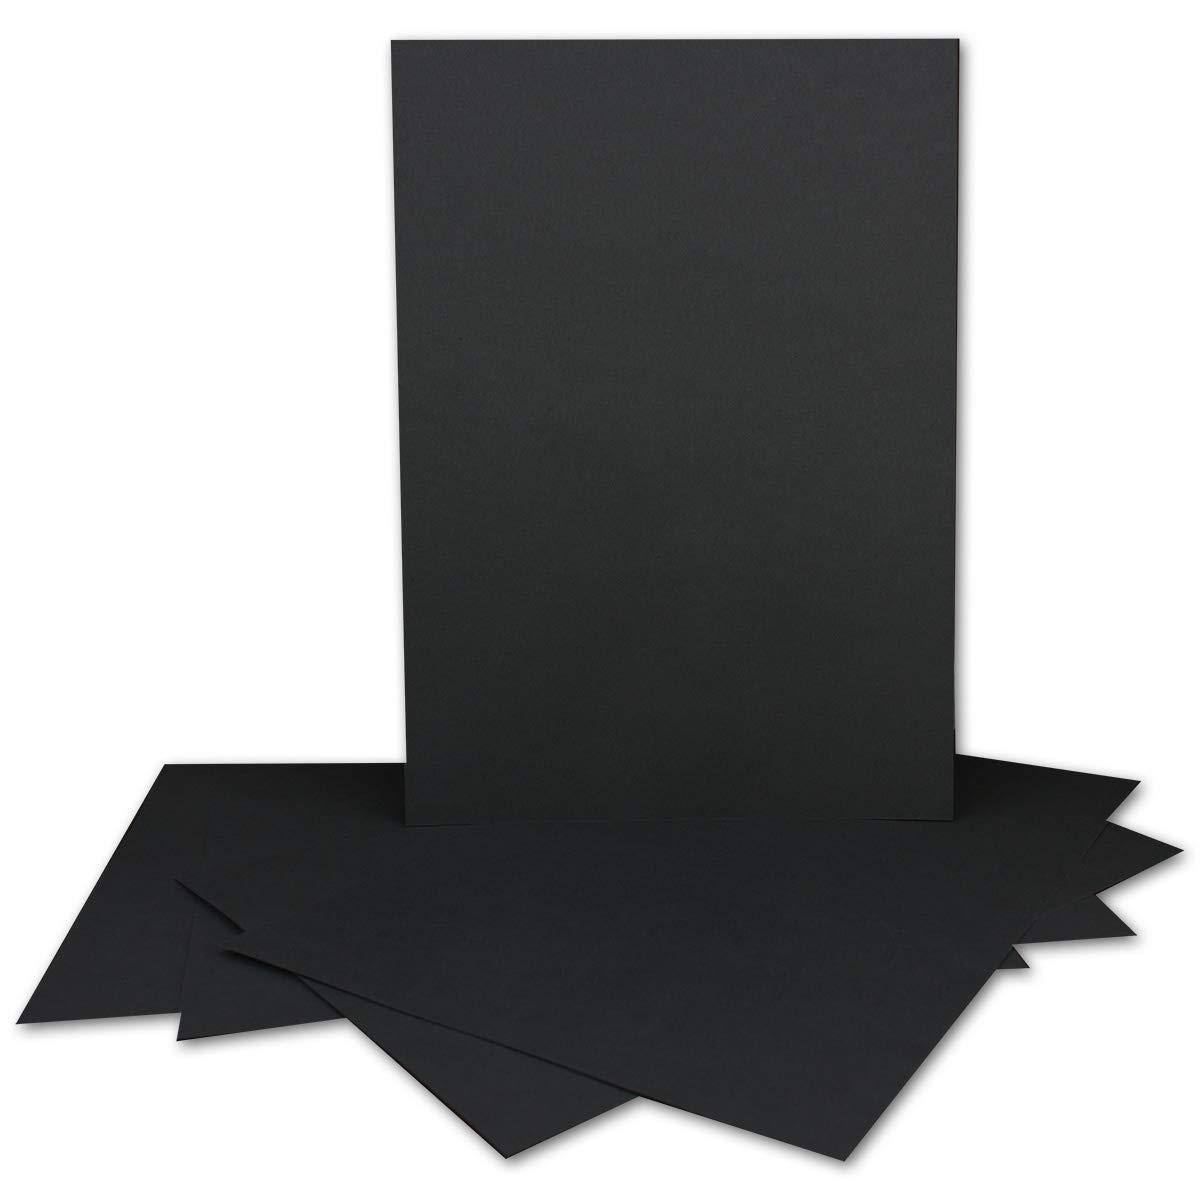 500 Naturpapier - Öko-Papier Öko-Papier Öko-Papier mit Lederanteil - 180 g m² - Sandfarben -100% Recycle-kompostierbar - FSC Zertifiziert - UPCYCLING - Glüxx-Agent B07PFBJ76M   Modisch  9c8142